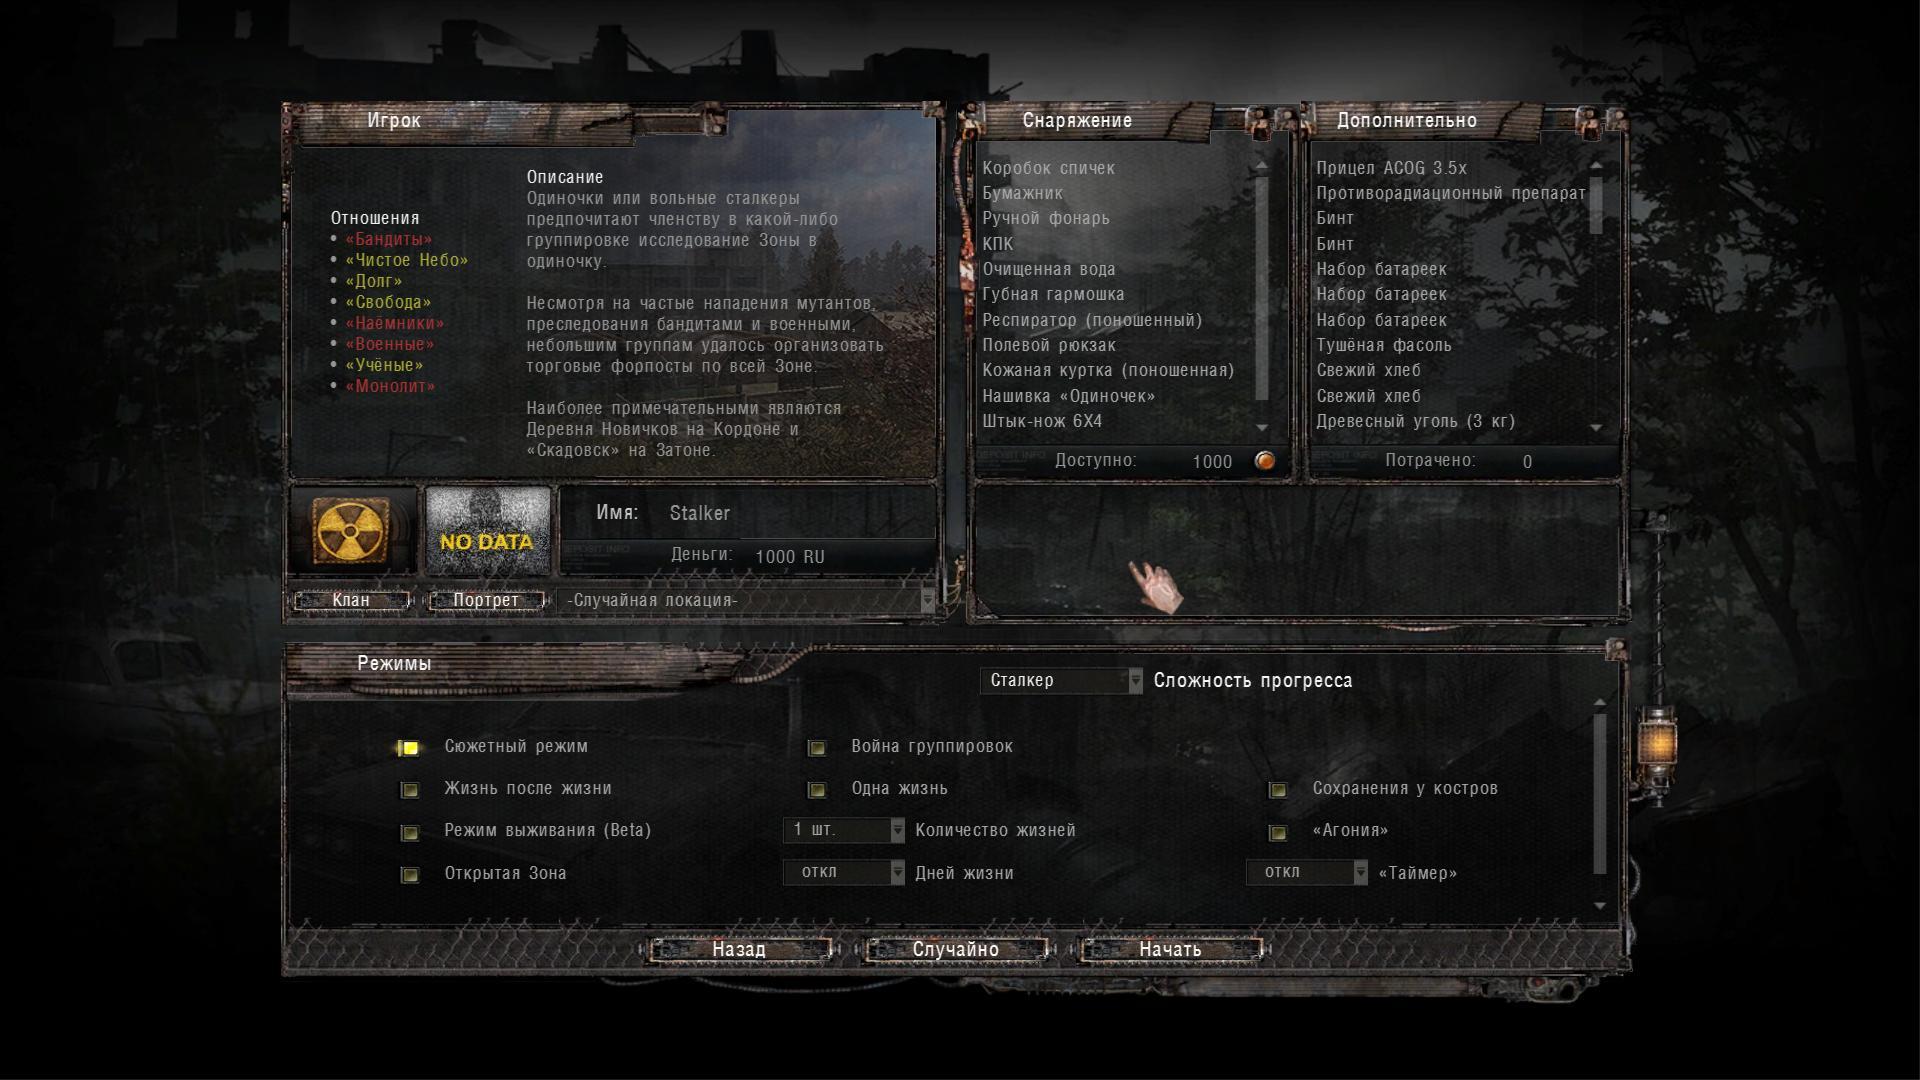 Интерфейс в Anomaly 1.5